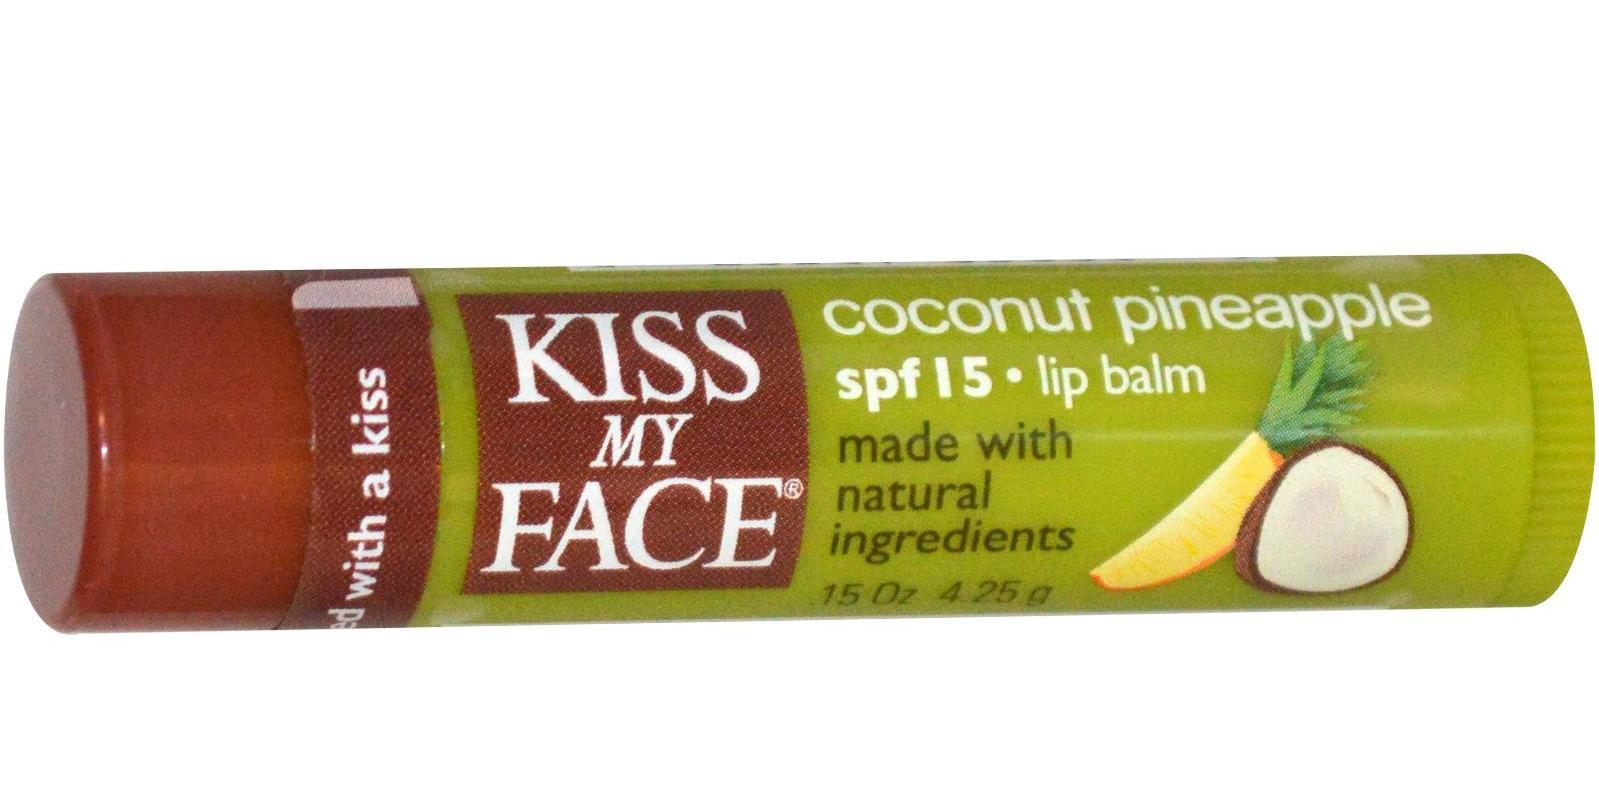 kiss my face coconut pineapple lip balm